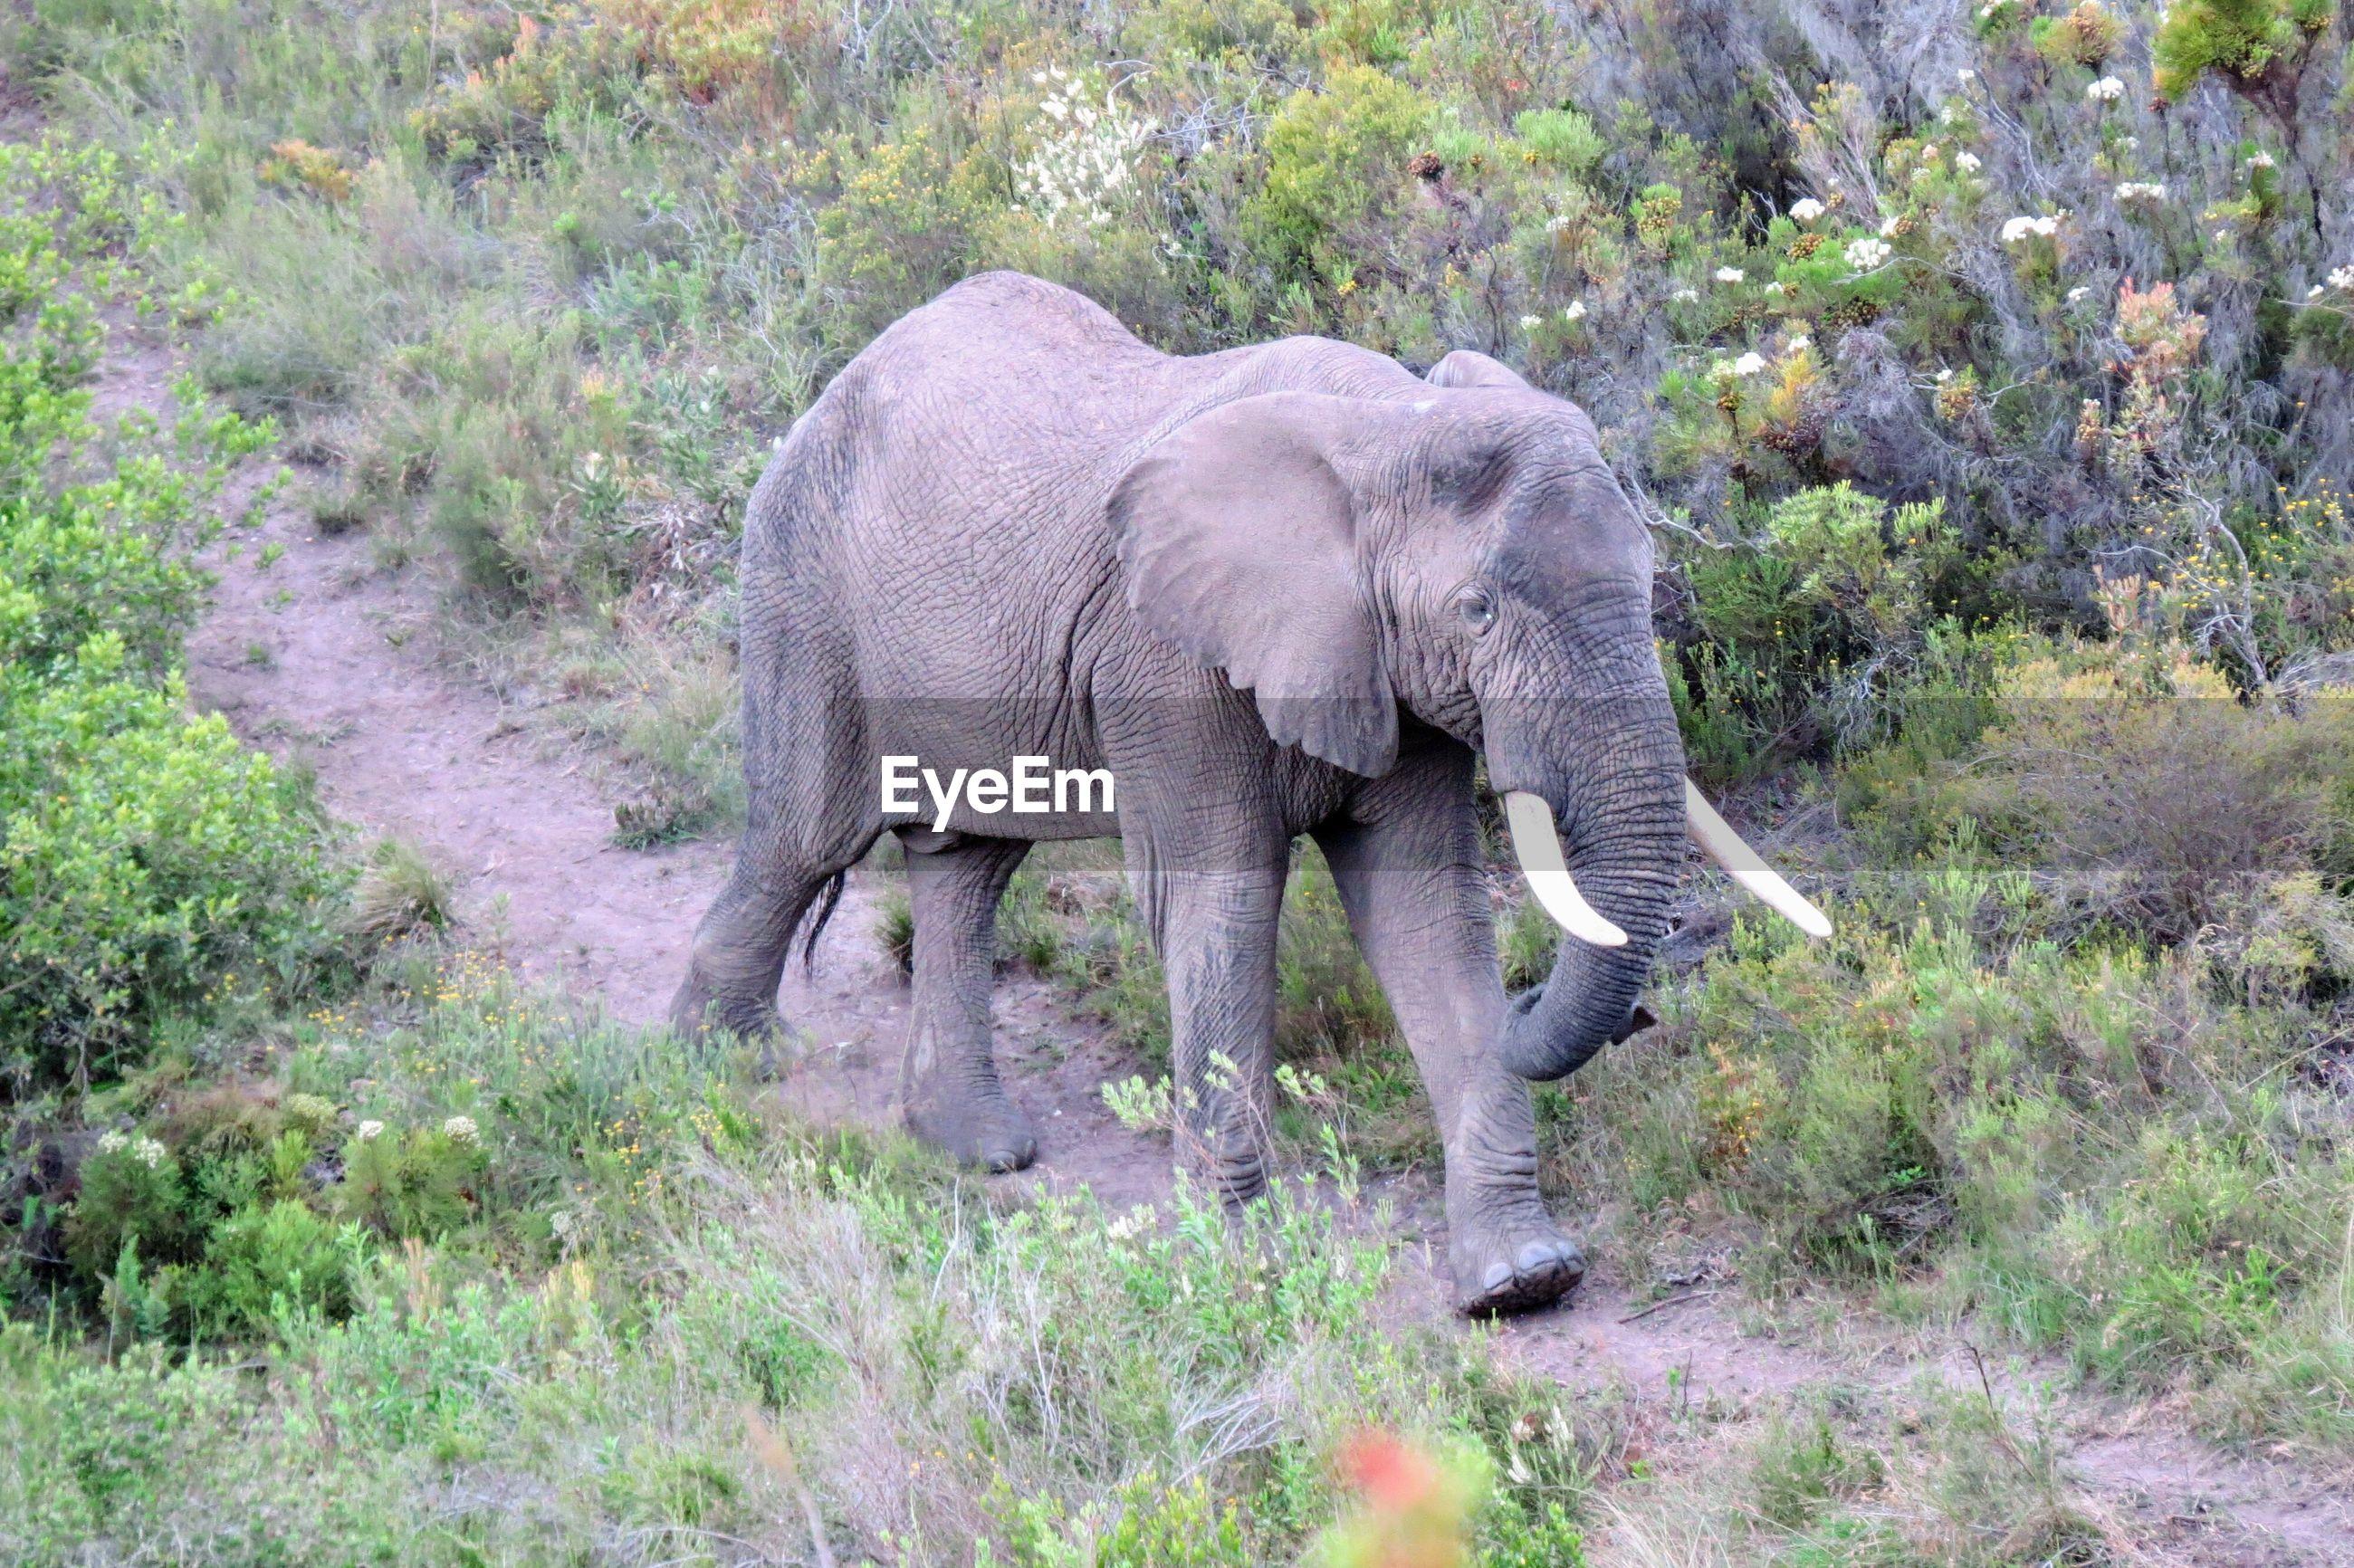 Elephant walking by plants in forest